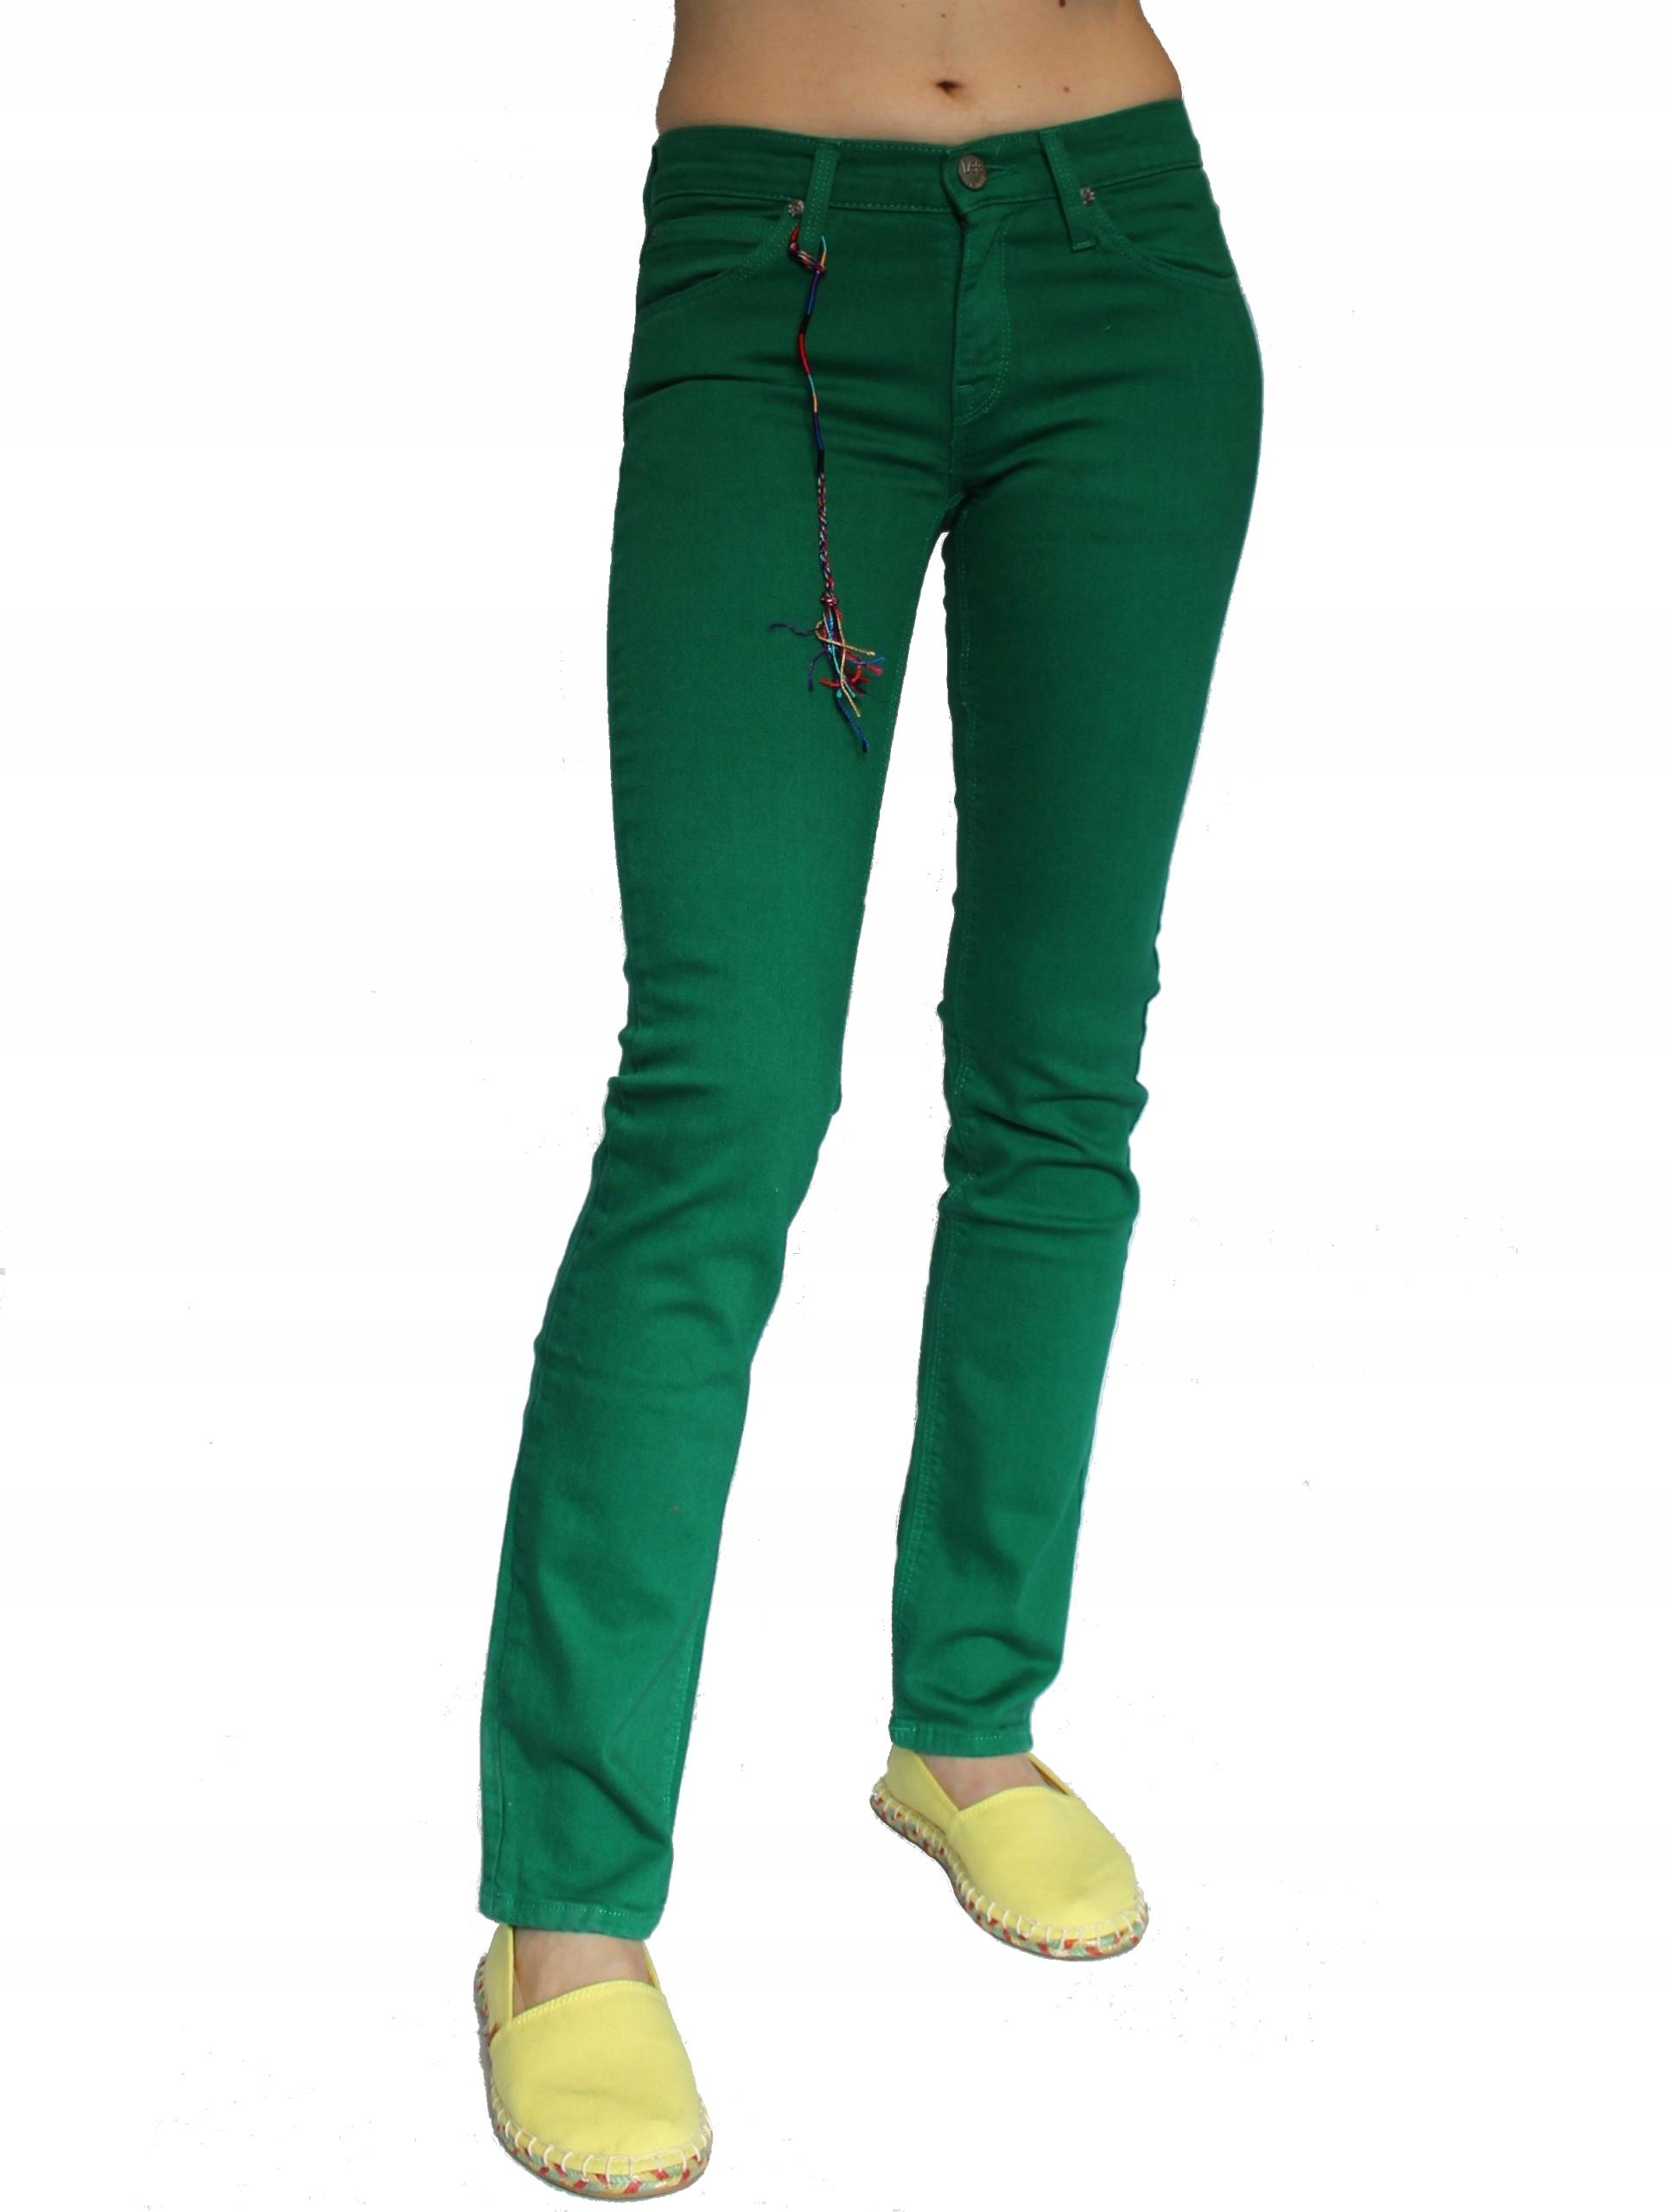 Lee Jade Colours Skinny Slim spodnie rurki W28 L33